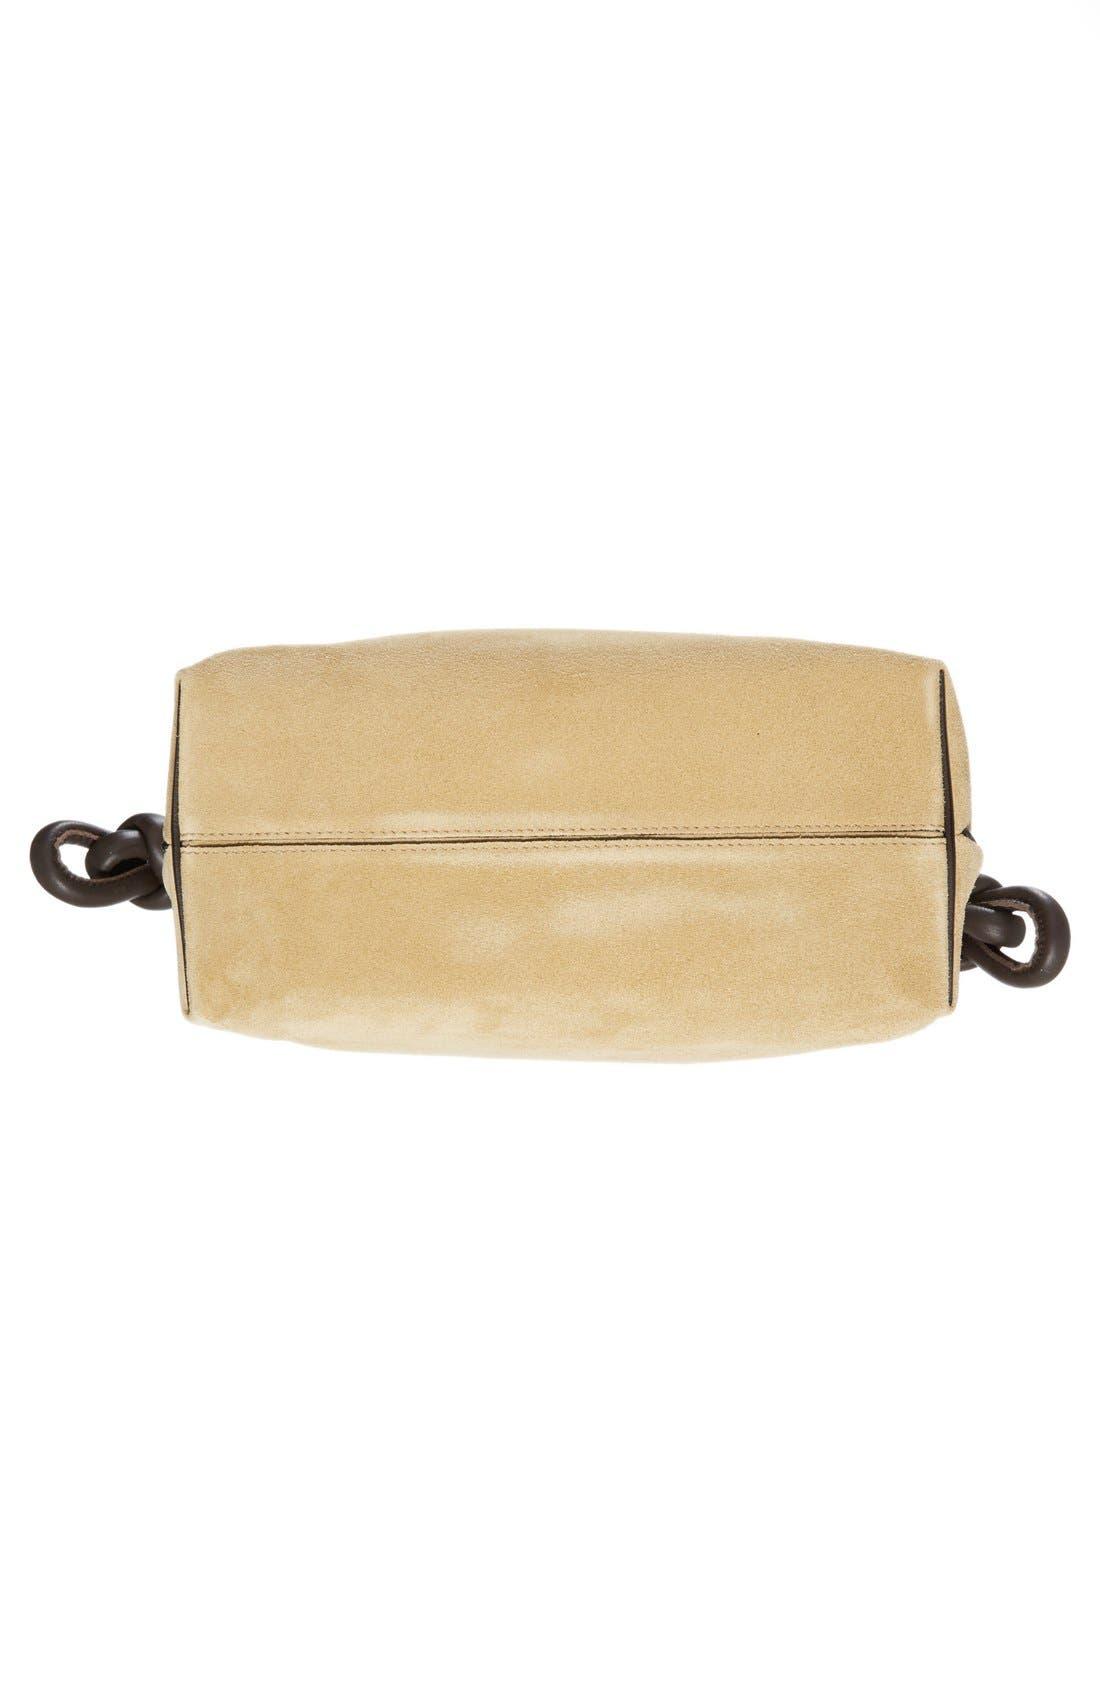 'Flamenco Knot' Suede & Calfskin Leather Bag,                             Alternate thumbnail 6, color,                             250